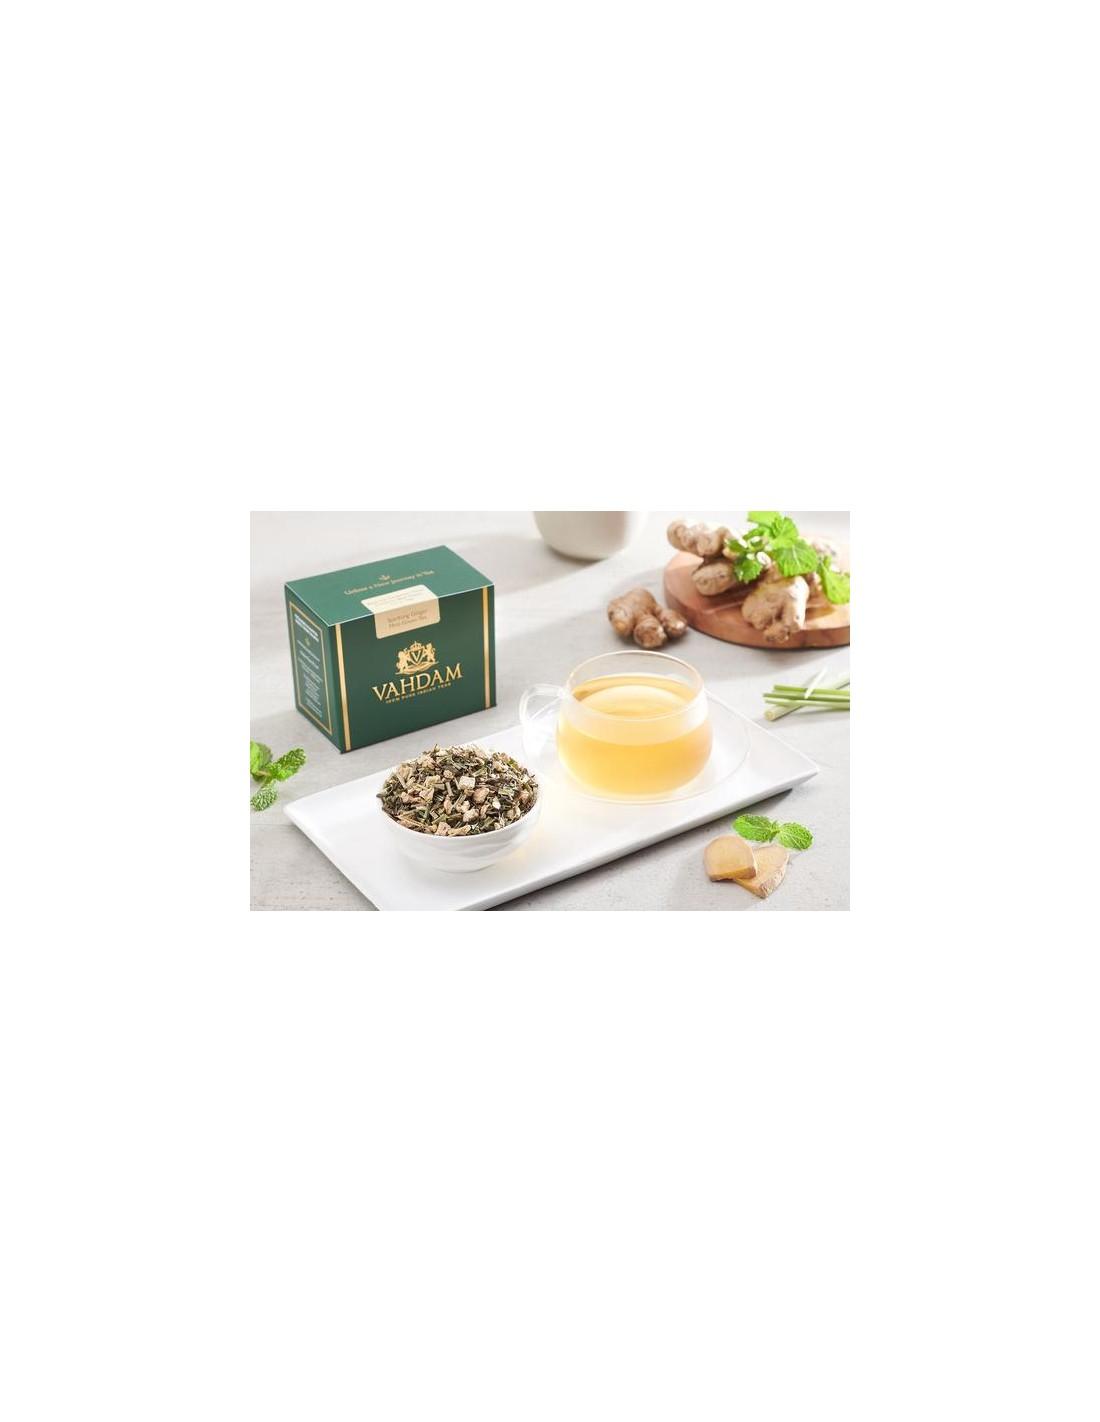 Sparkling Ginger Mint Green Tea - Republika Smaków Sp. z o.o.